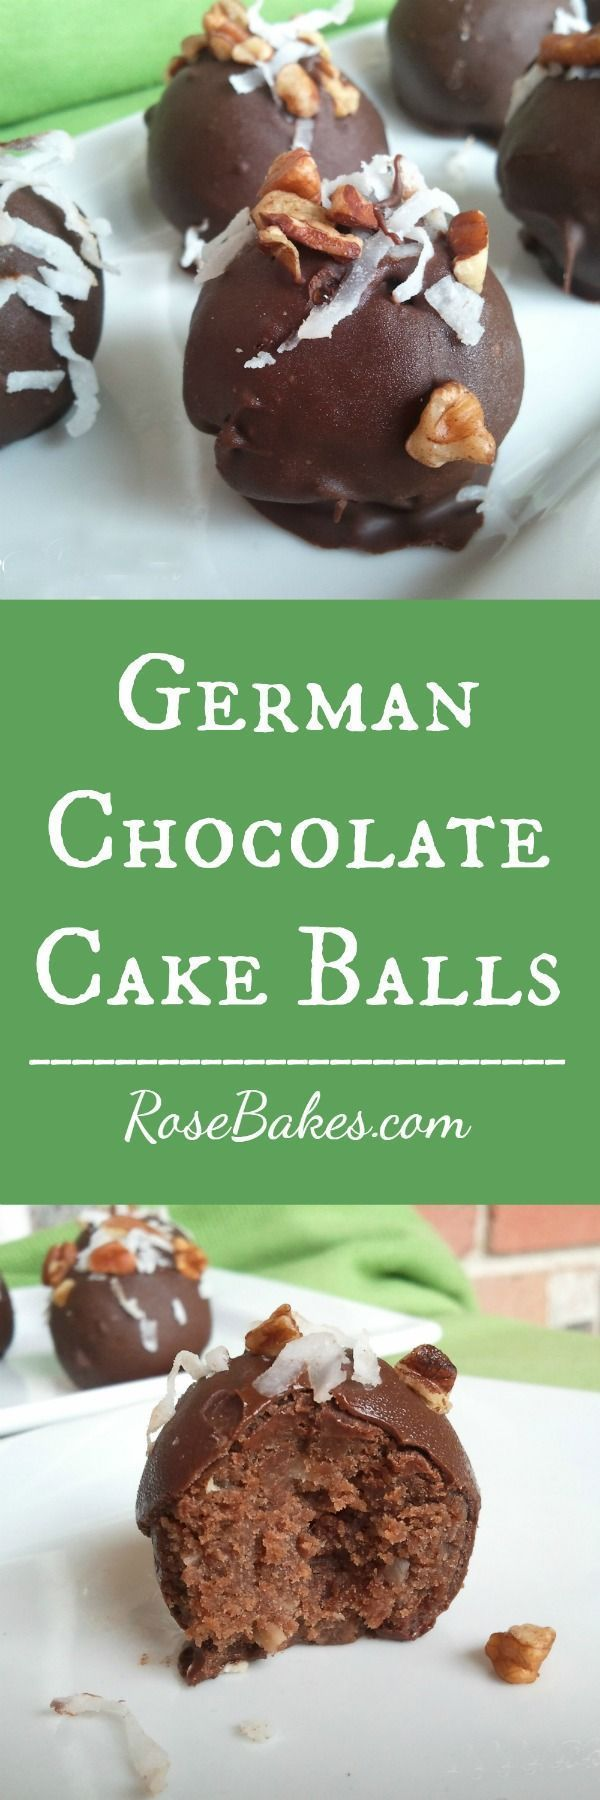 German Chocolate Cake Balls | RoseBakes.com #GermanChocolate #CakeBalls #Recipe